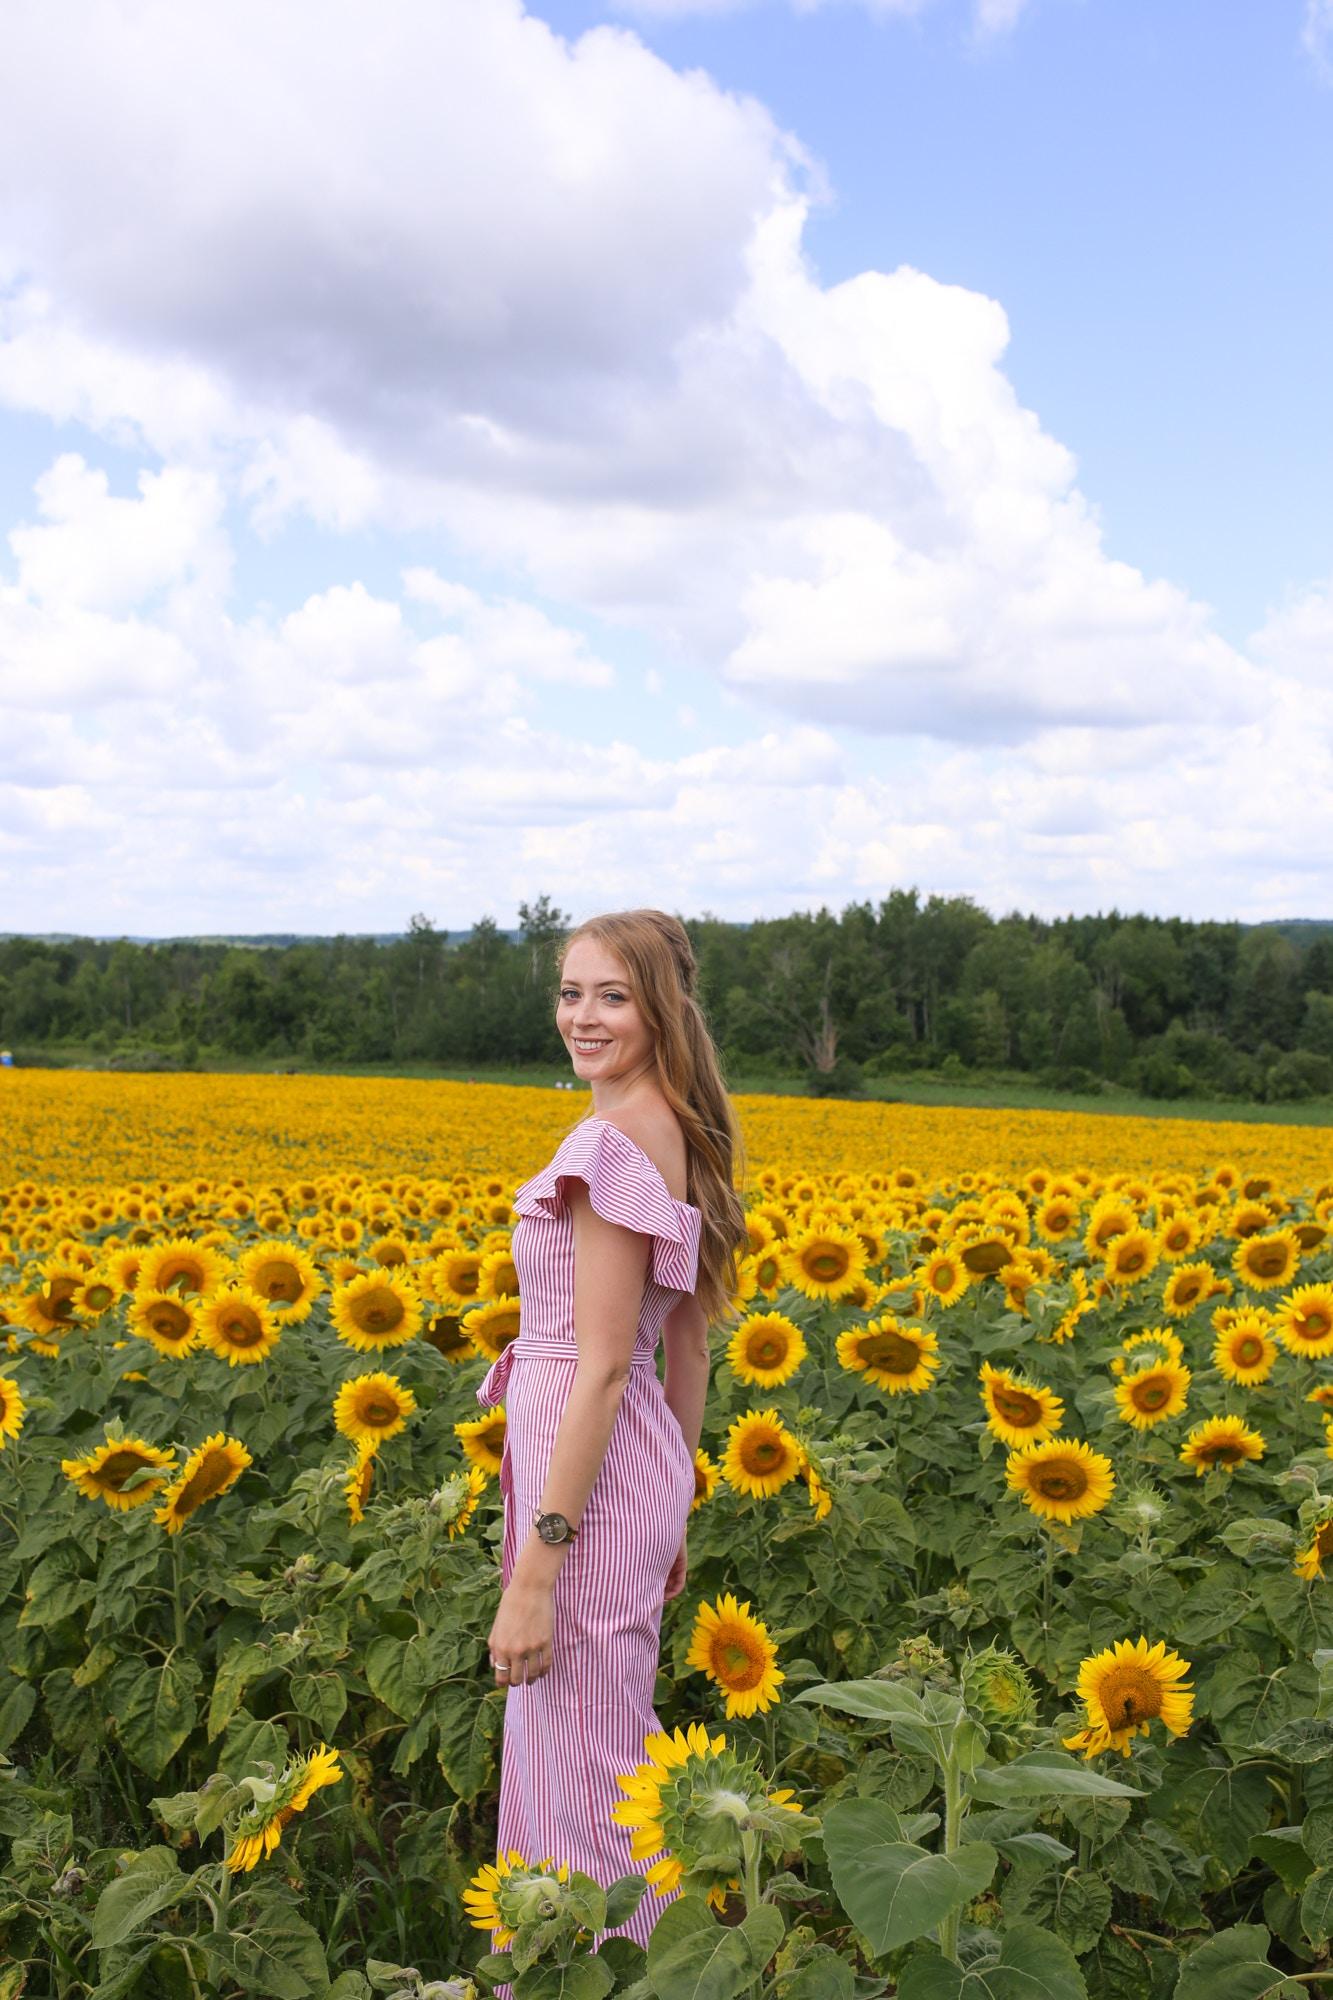 sunflower fields near toronto that are still open